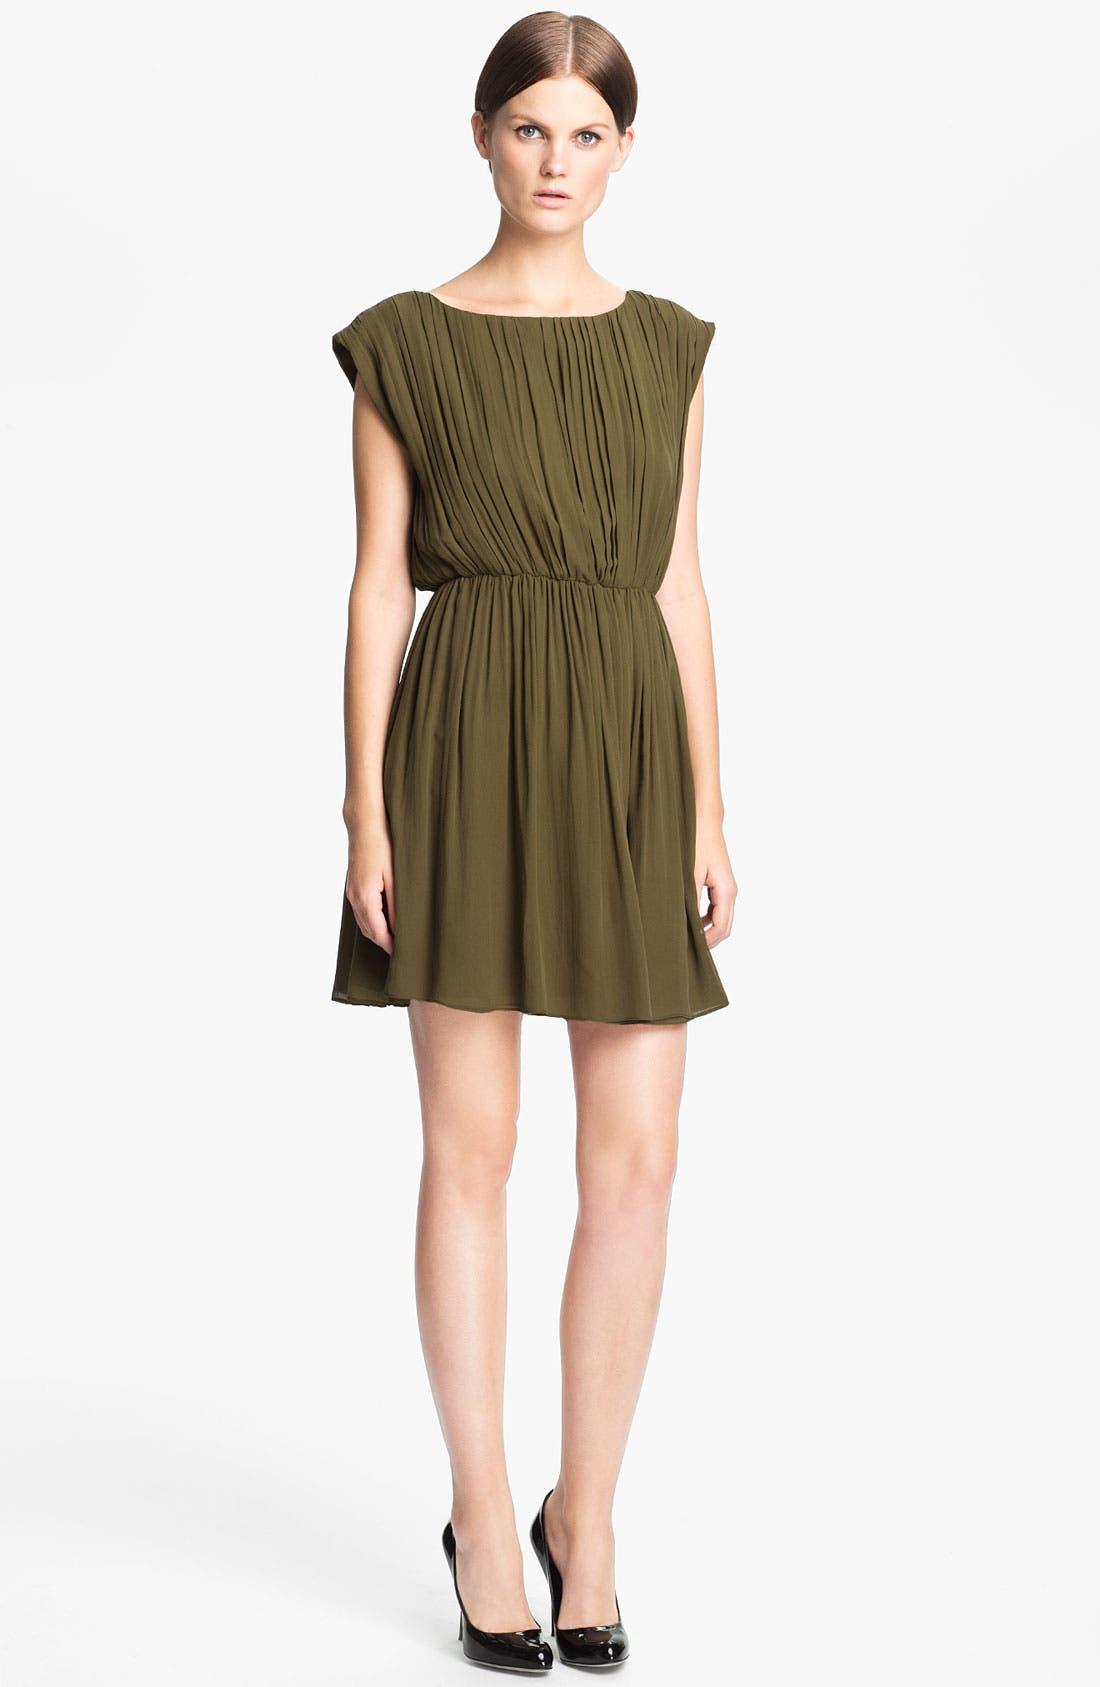 Alternate Image 1 Selected - Alice + Olivia 'Josie' Ruched Blouson Dress